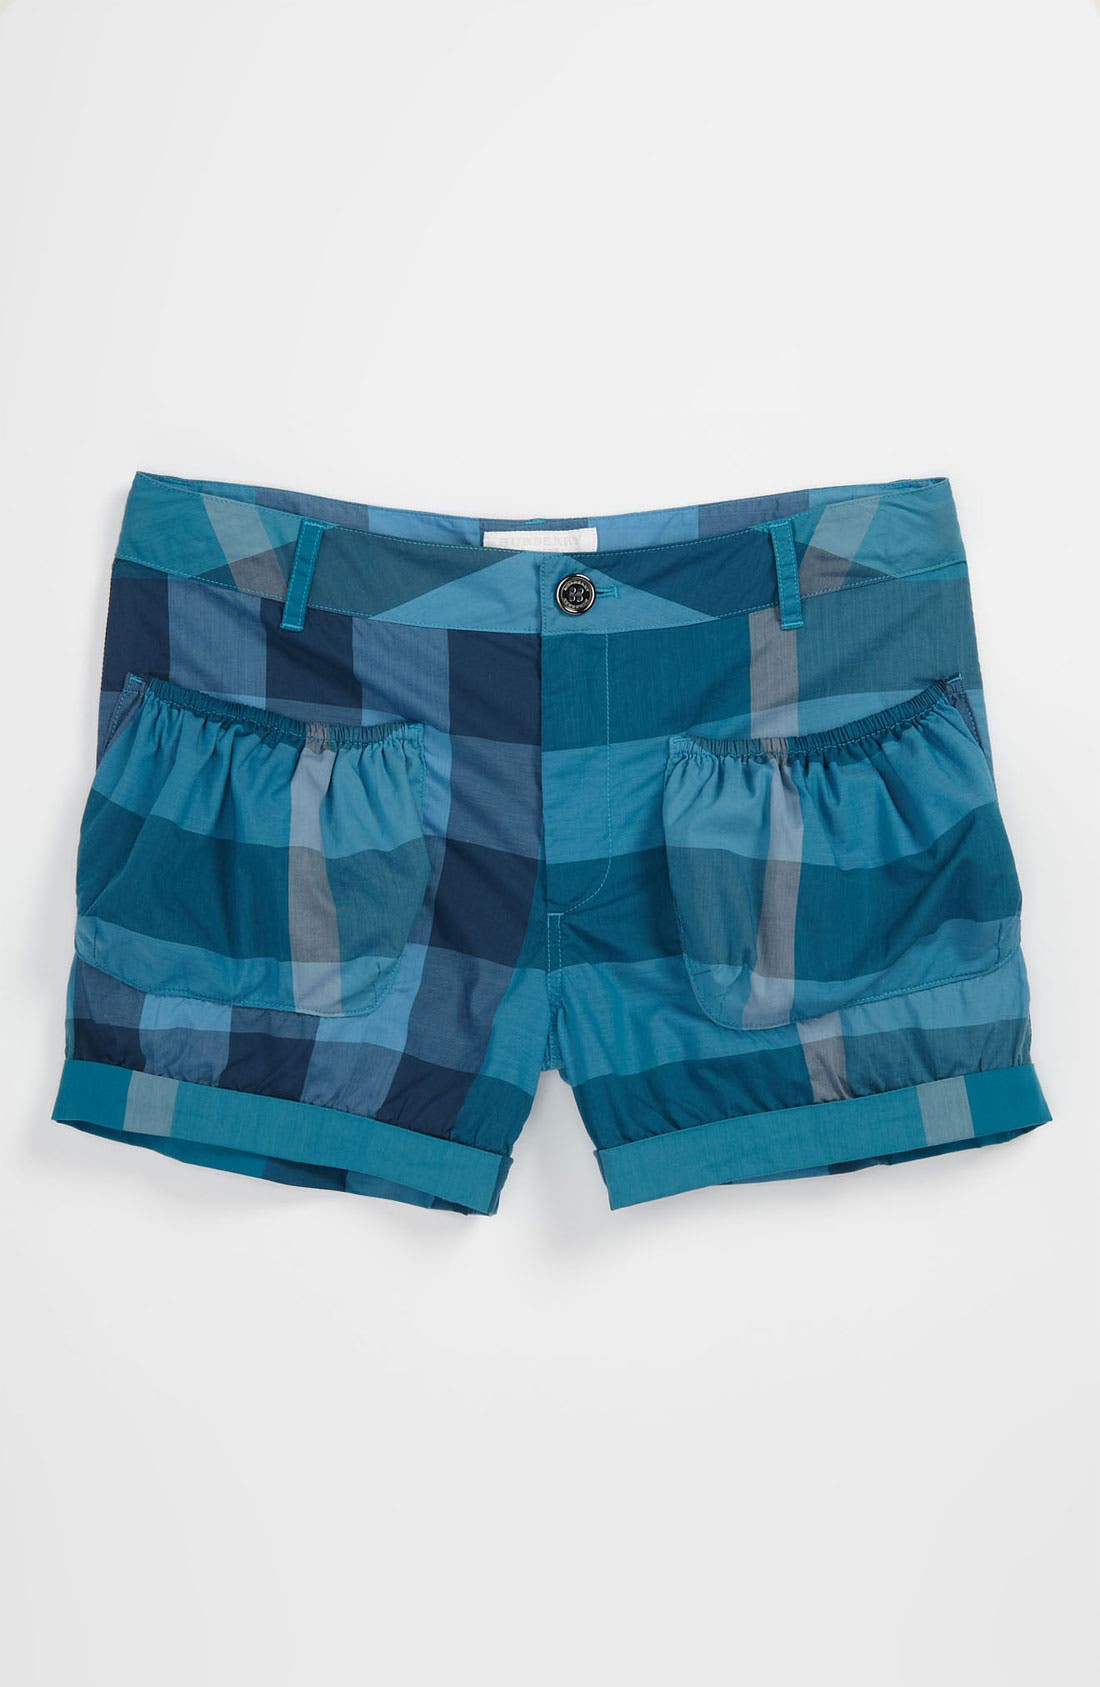 Alternate Image 1 Selected - Burberry 'Pauline' Shorts (Little Girls & Big Girls)